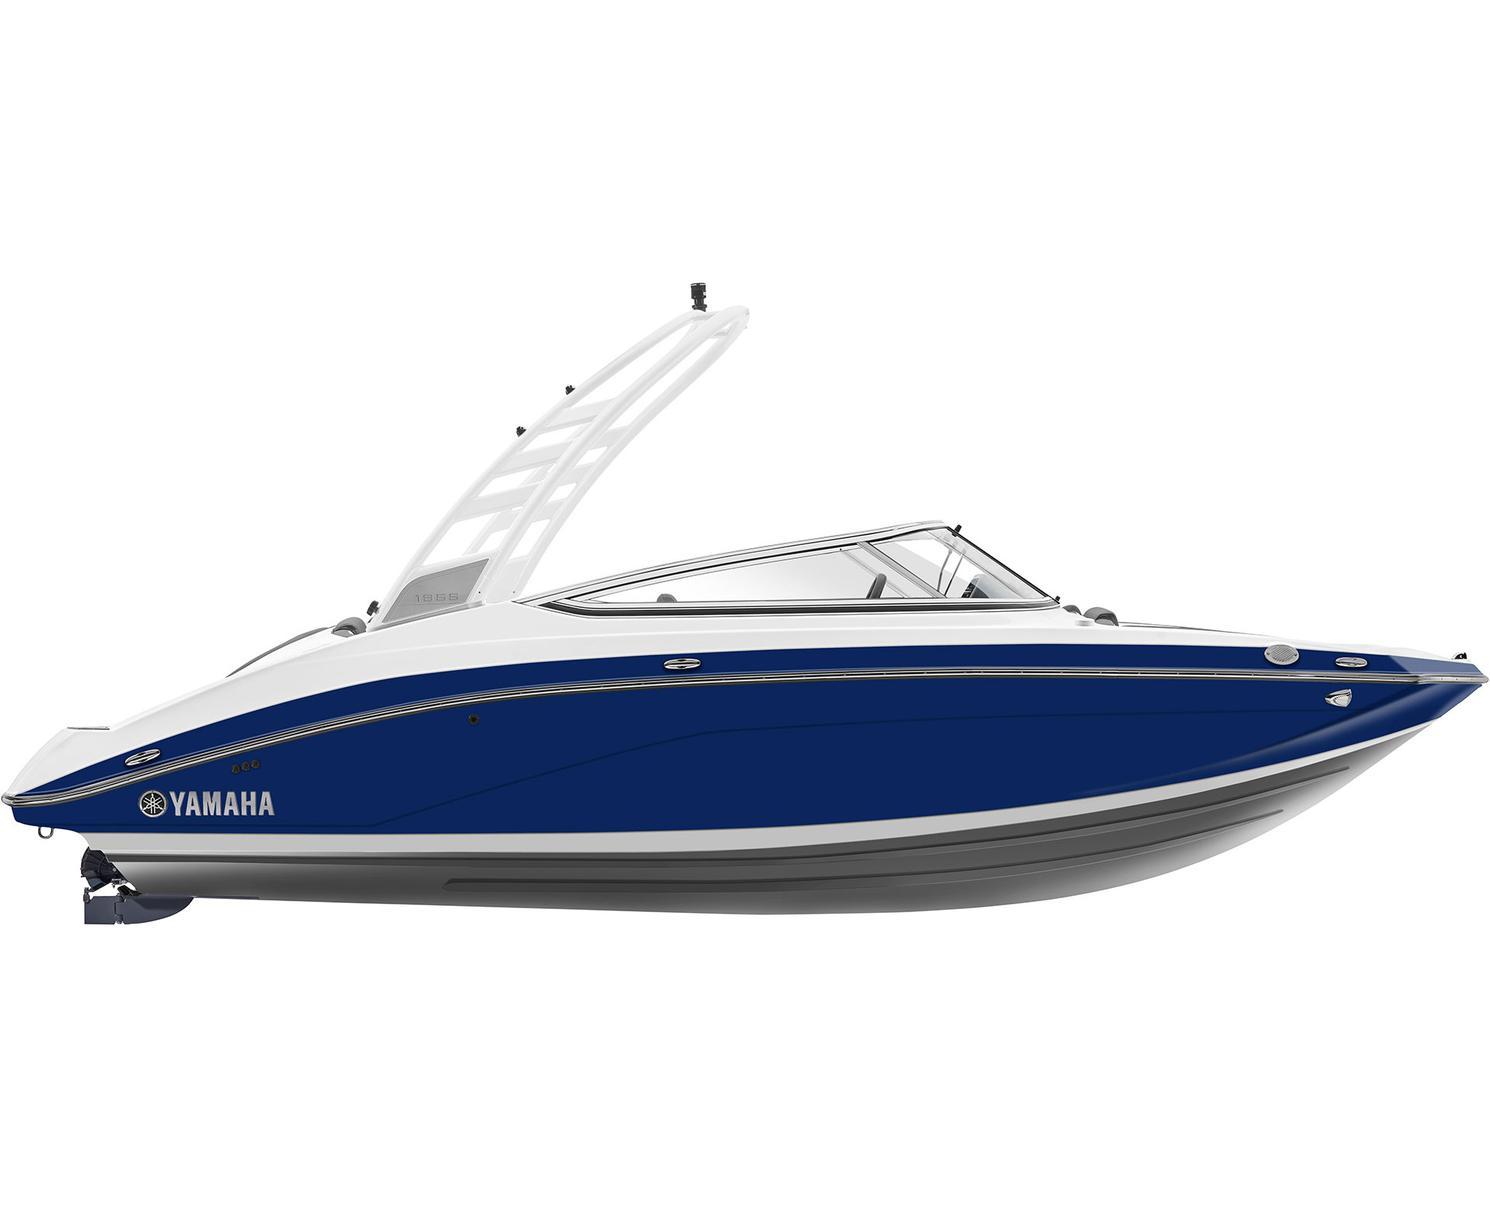 Yamaha 195S Yacht Blue